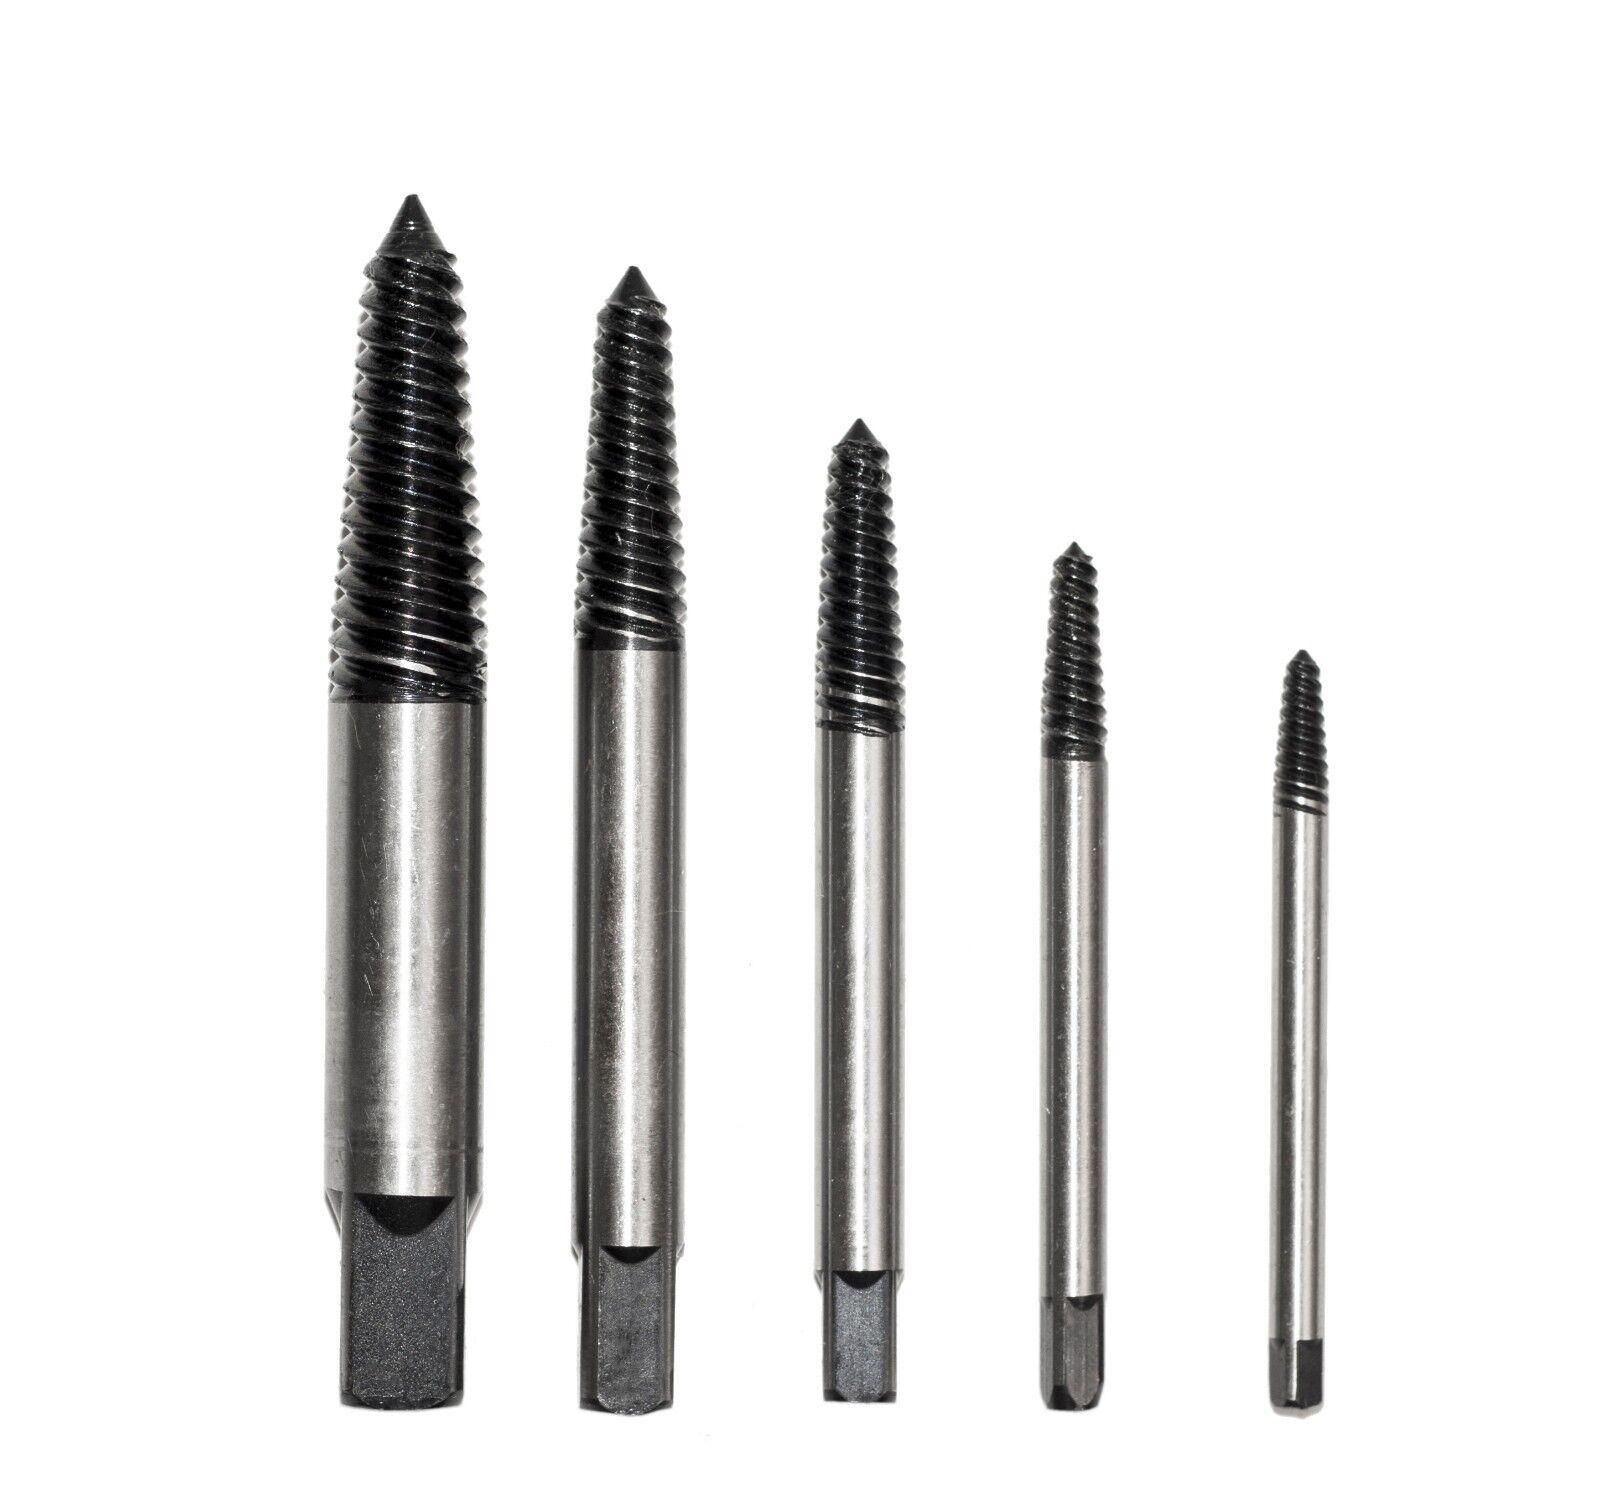 5PC Screw Extractor Set Drill Bits Screws Bolt Remover - Sam